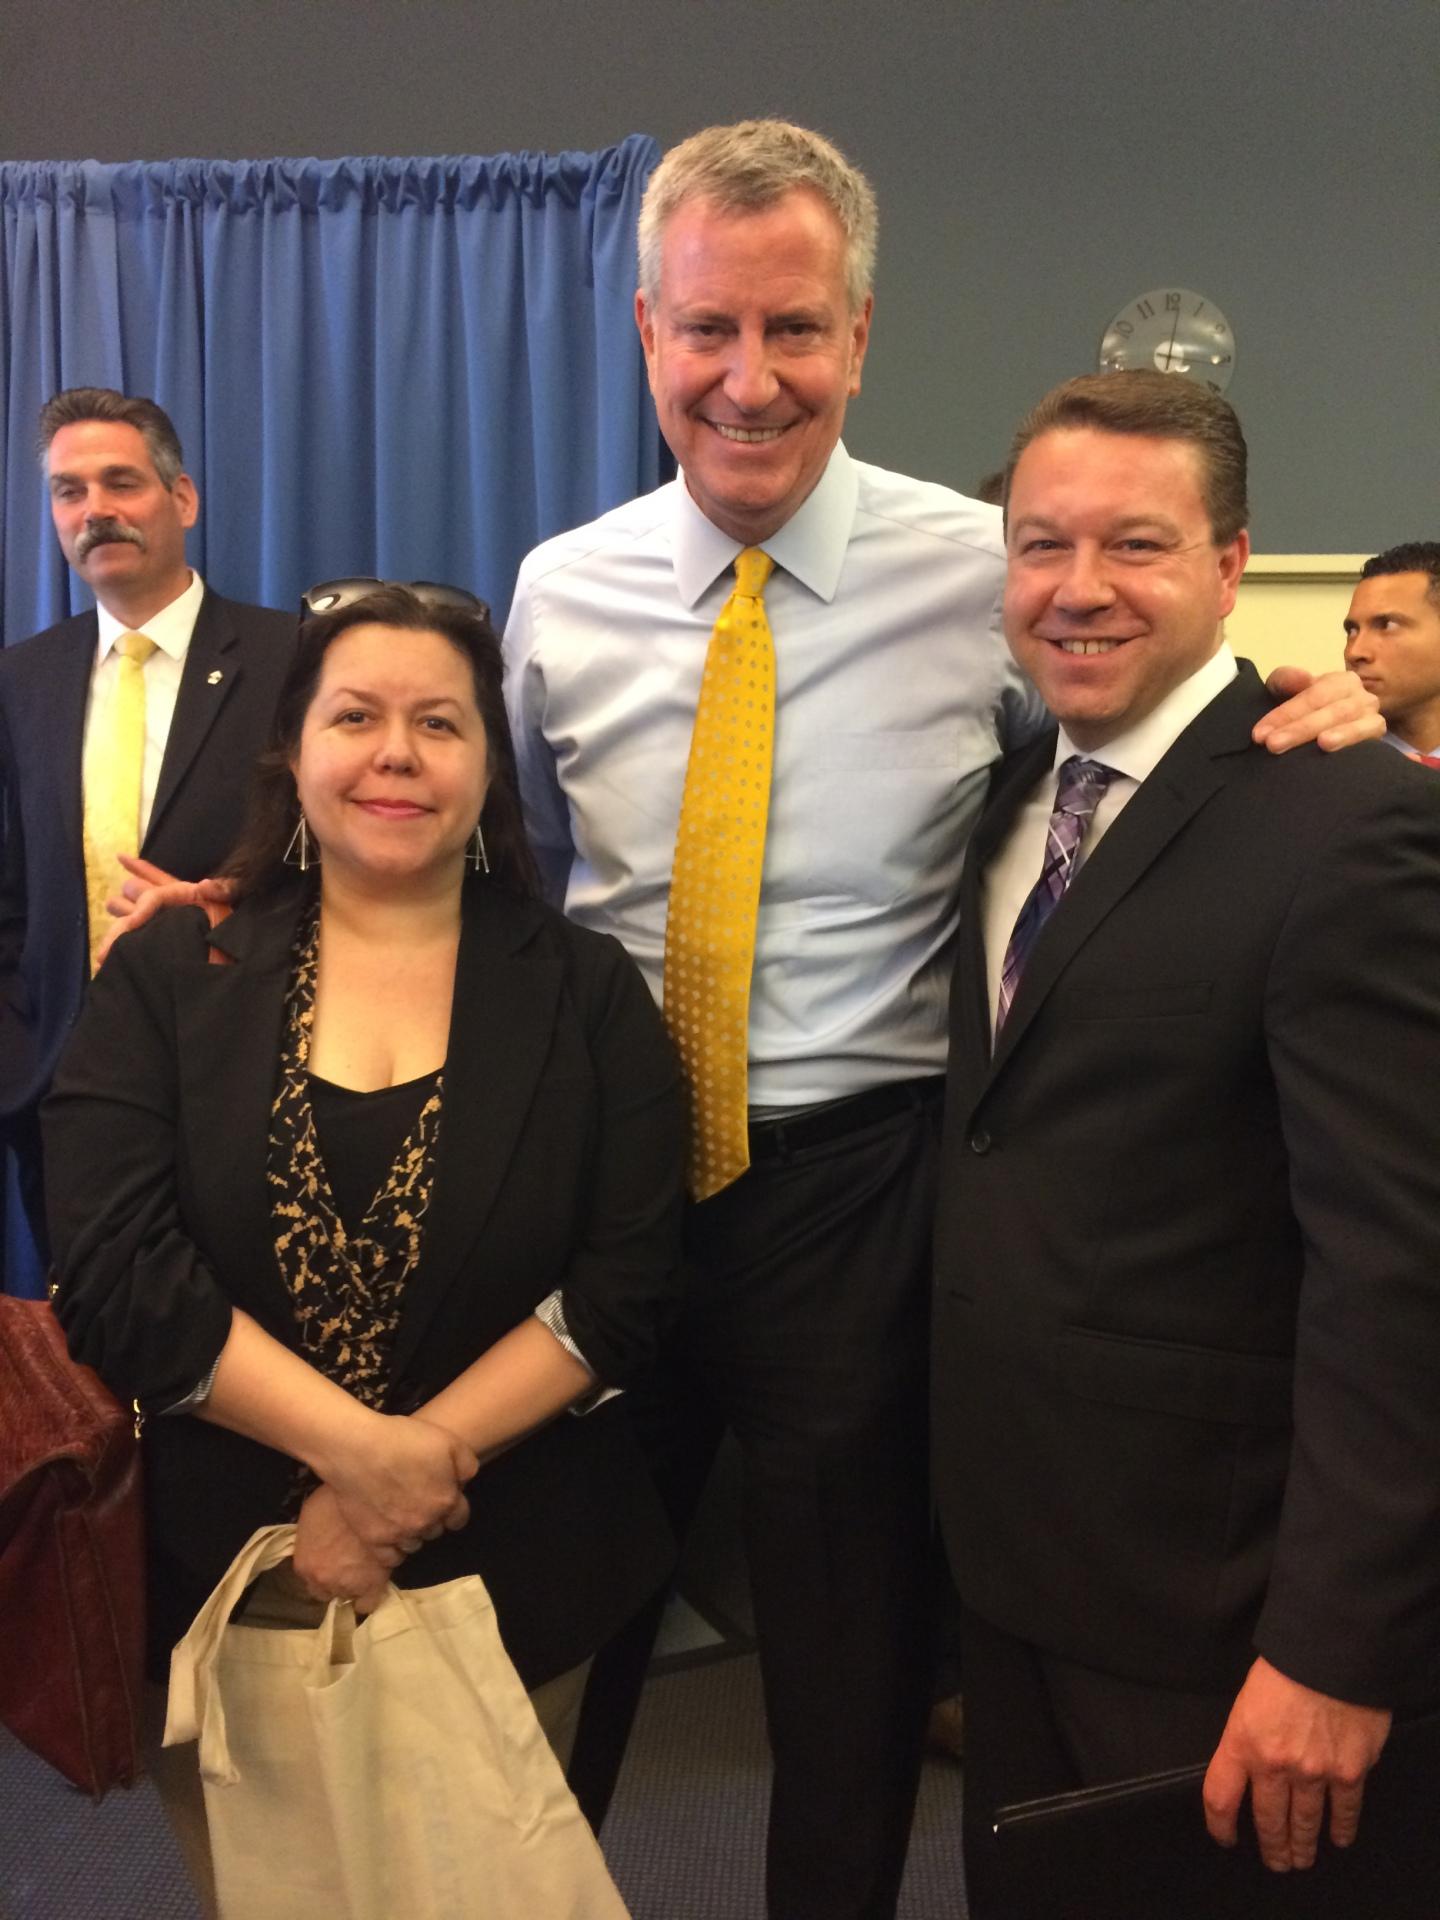 Meeting with Mayor DeBlasio